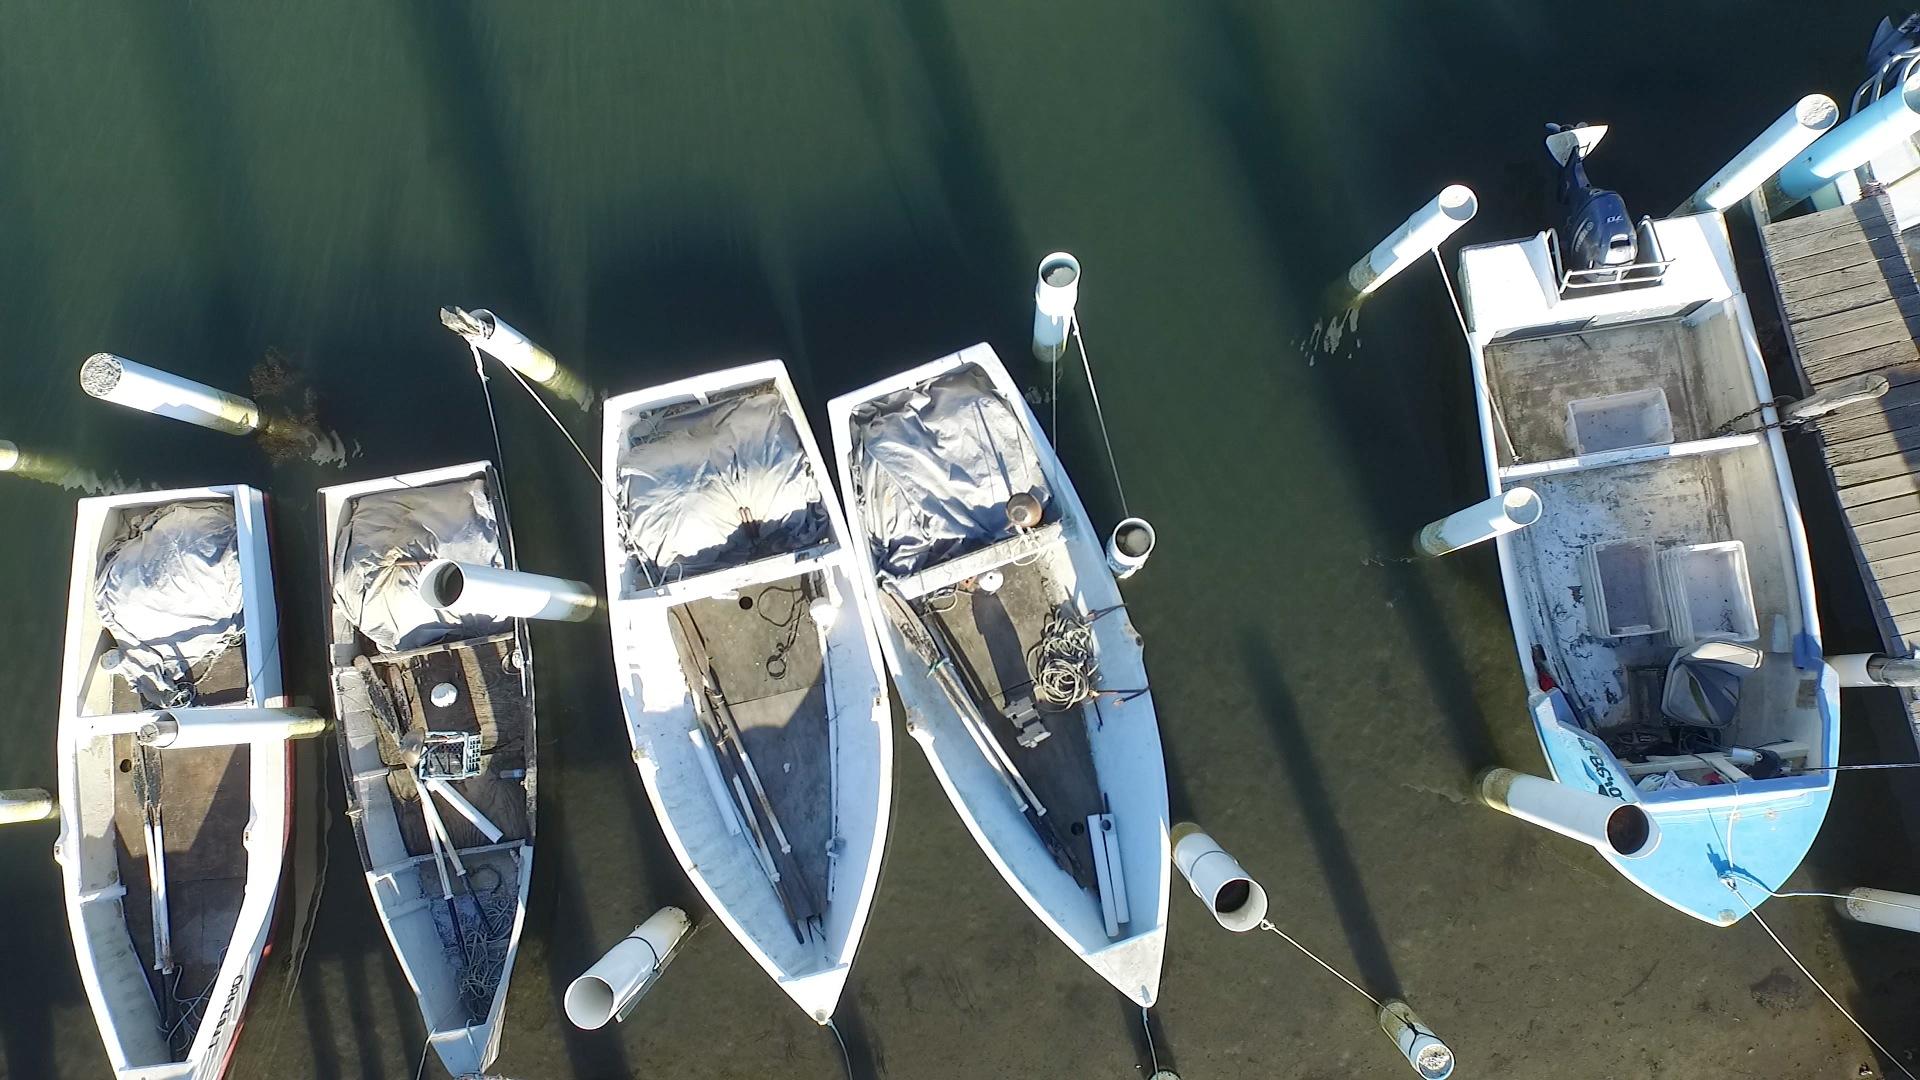 Tuncurry Boats